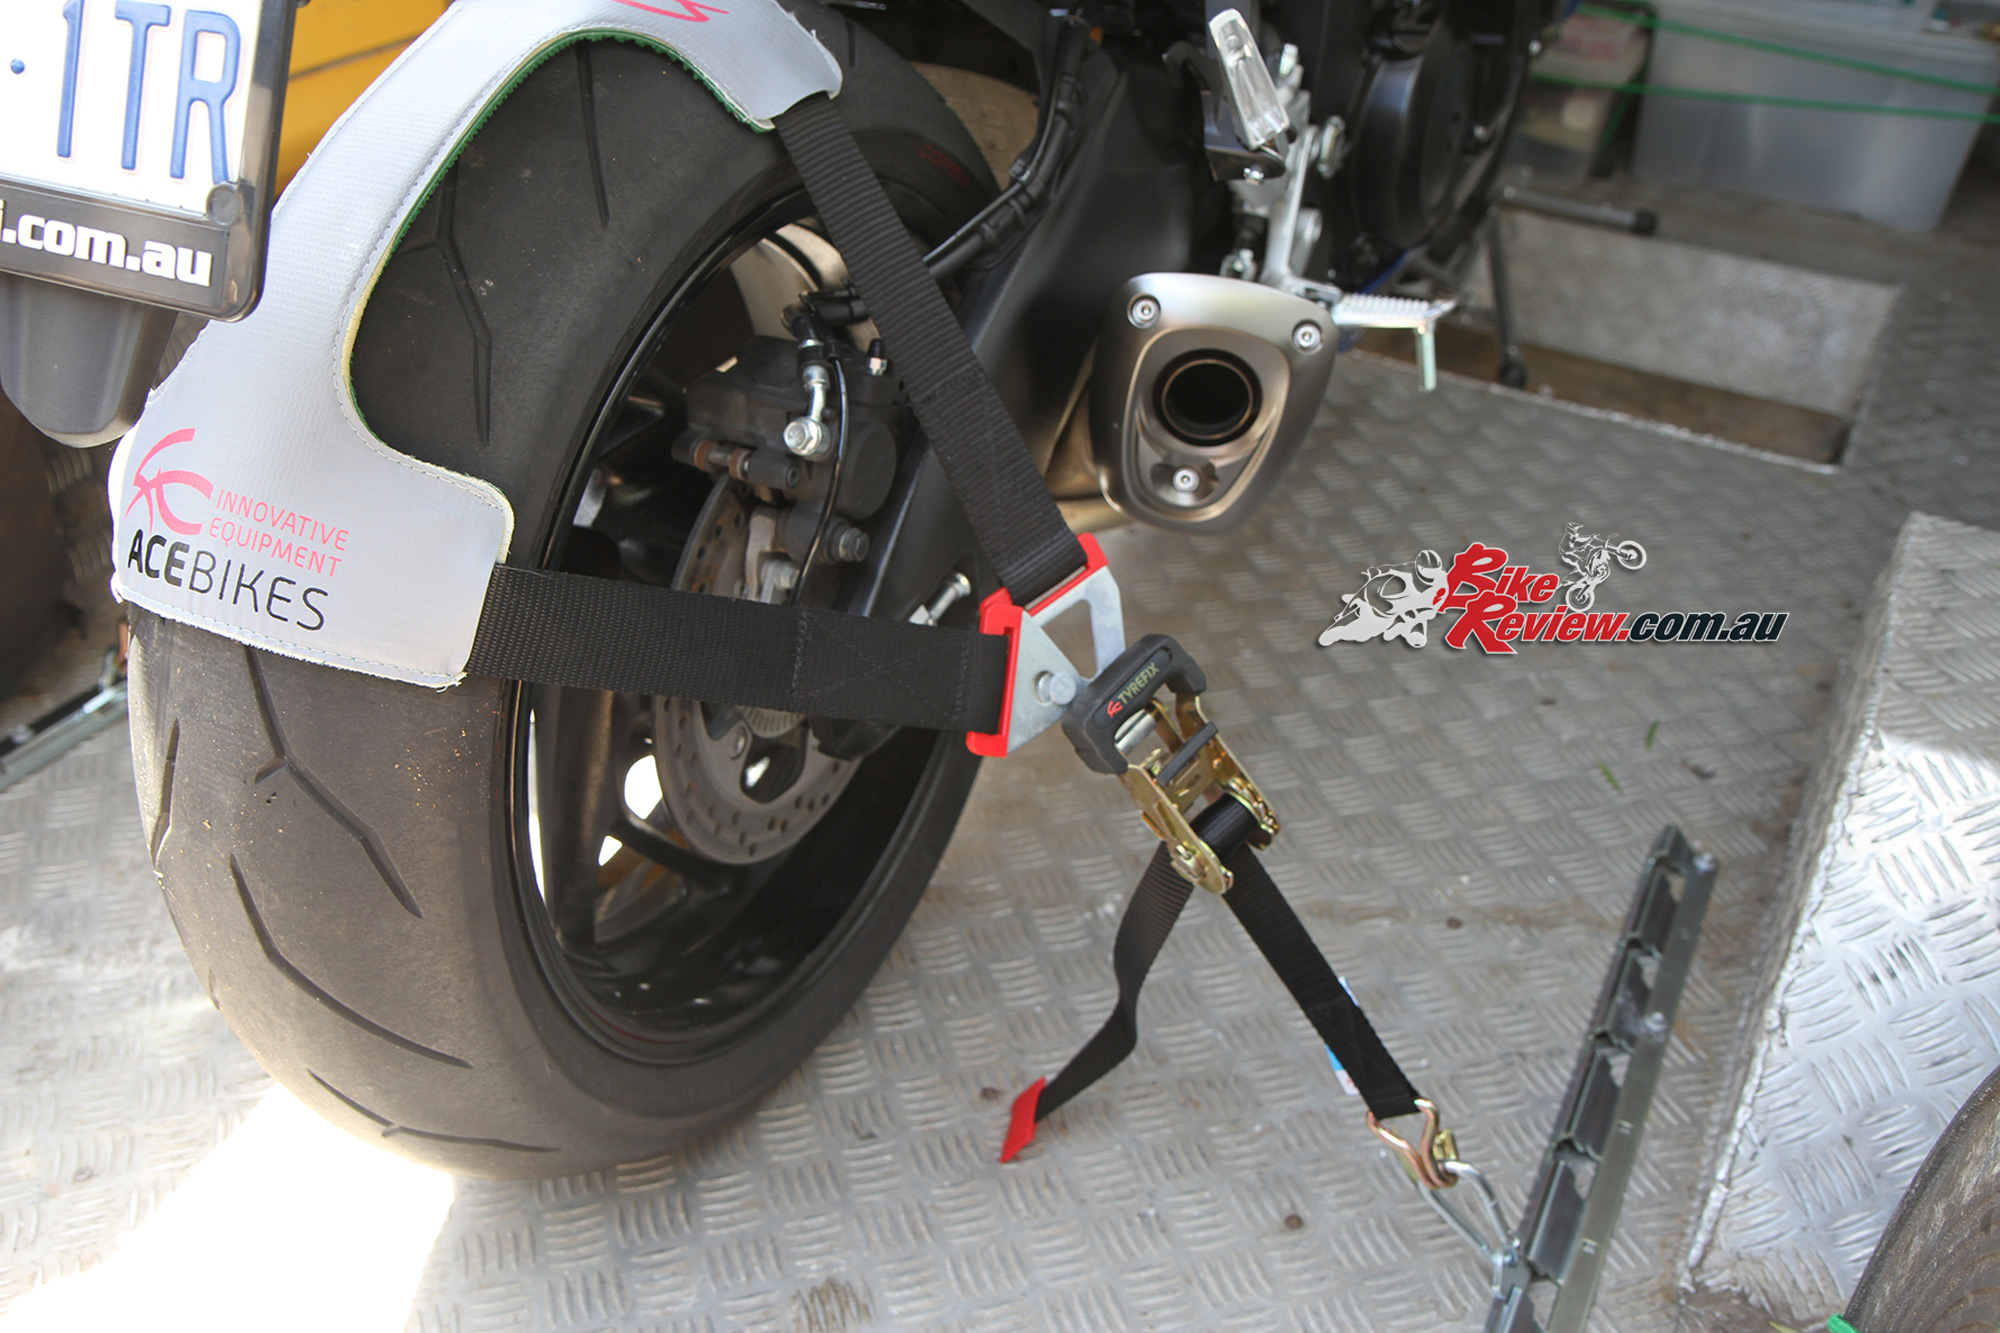 New Product Acebikes Flexi Rail Amp Tyrefix Bike Review